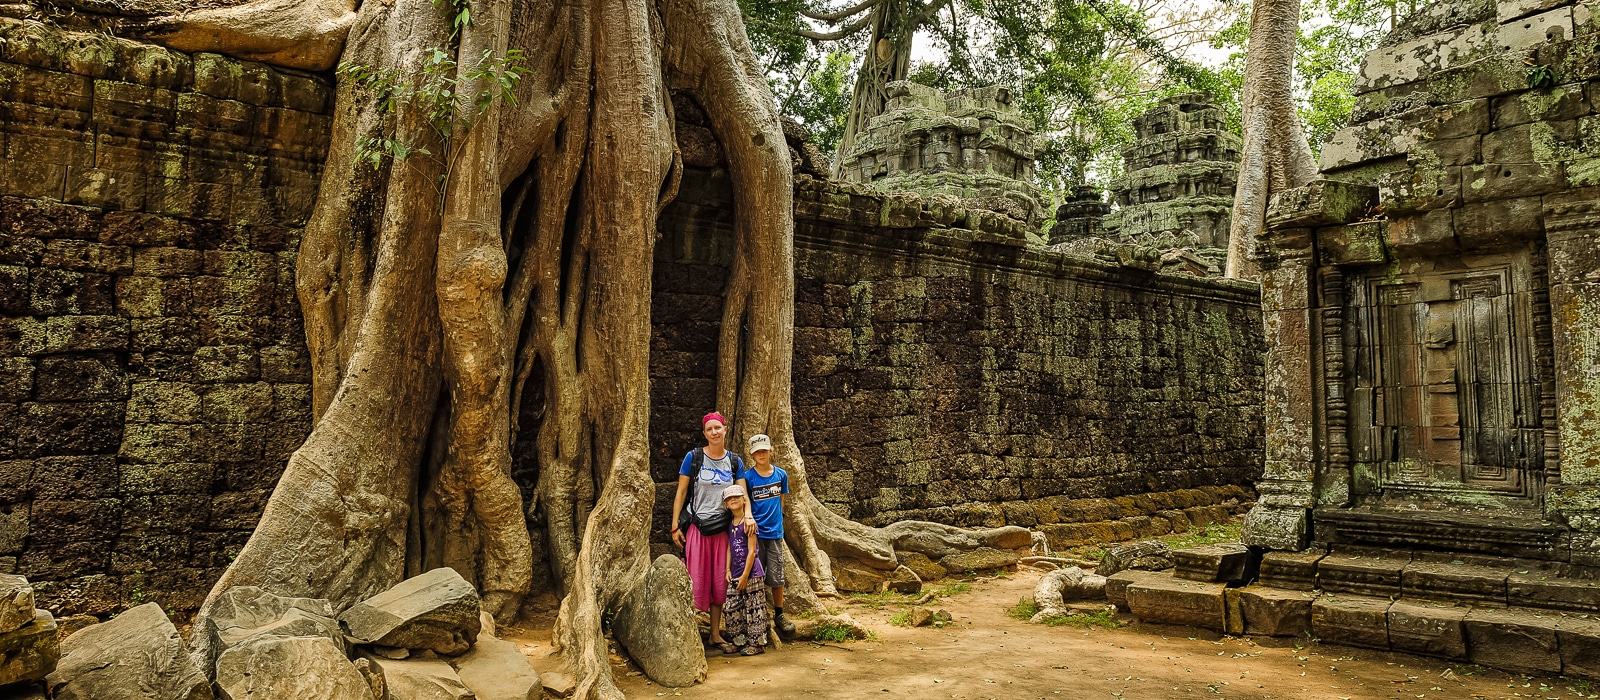 thumb - Cambodge-1600x700-12-2.jpg